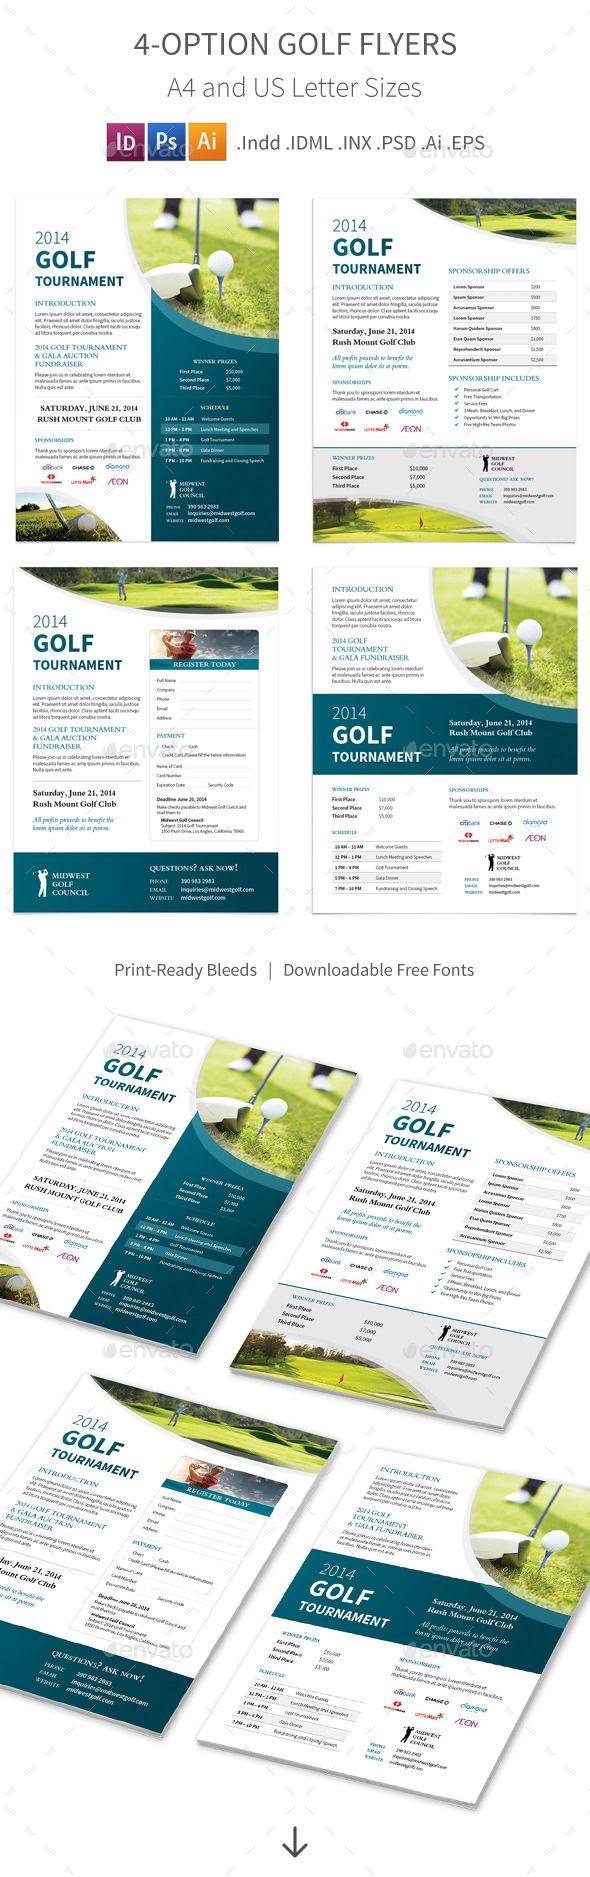 Golf Tournament Flyers  U2013 4 Options